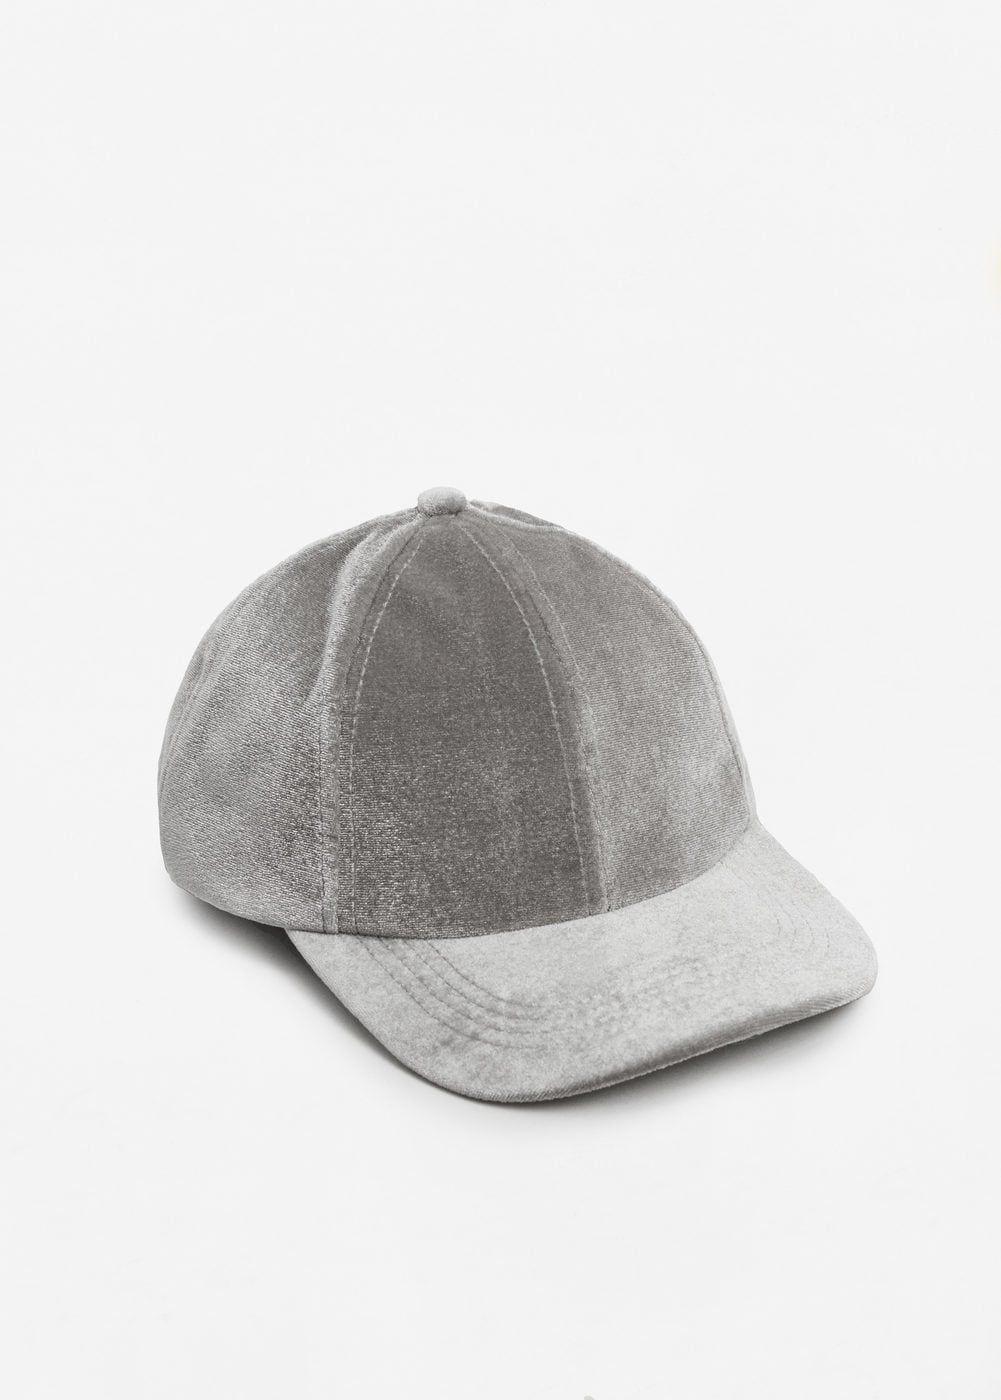 b9dc8330b Velvet cap - Women in 2019 | Street chic | Baseball hats, Hats, Cap